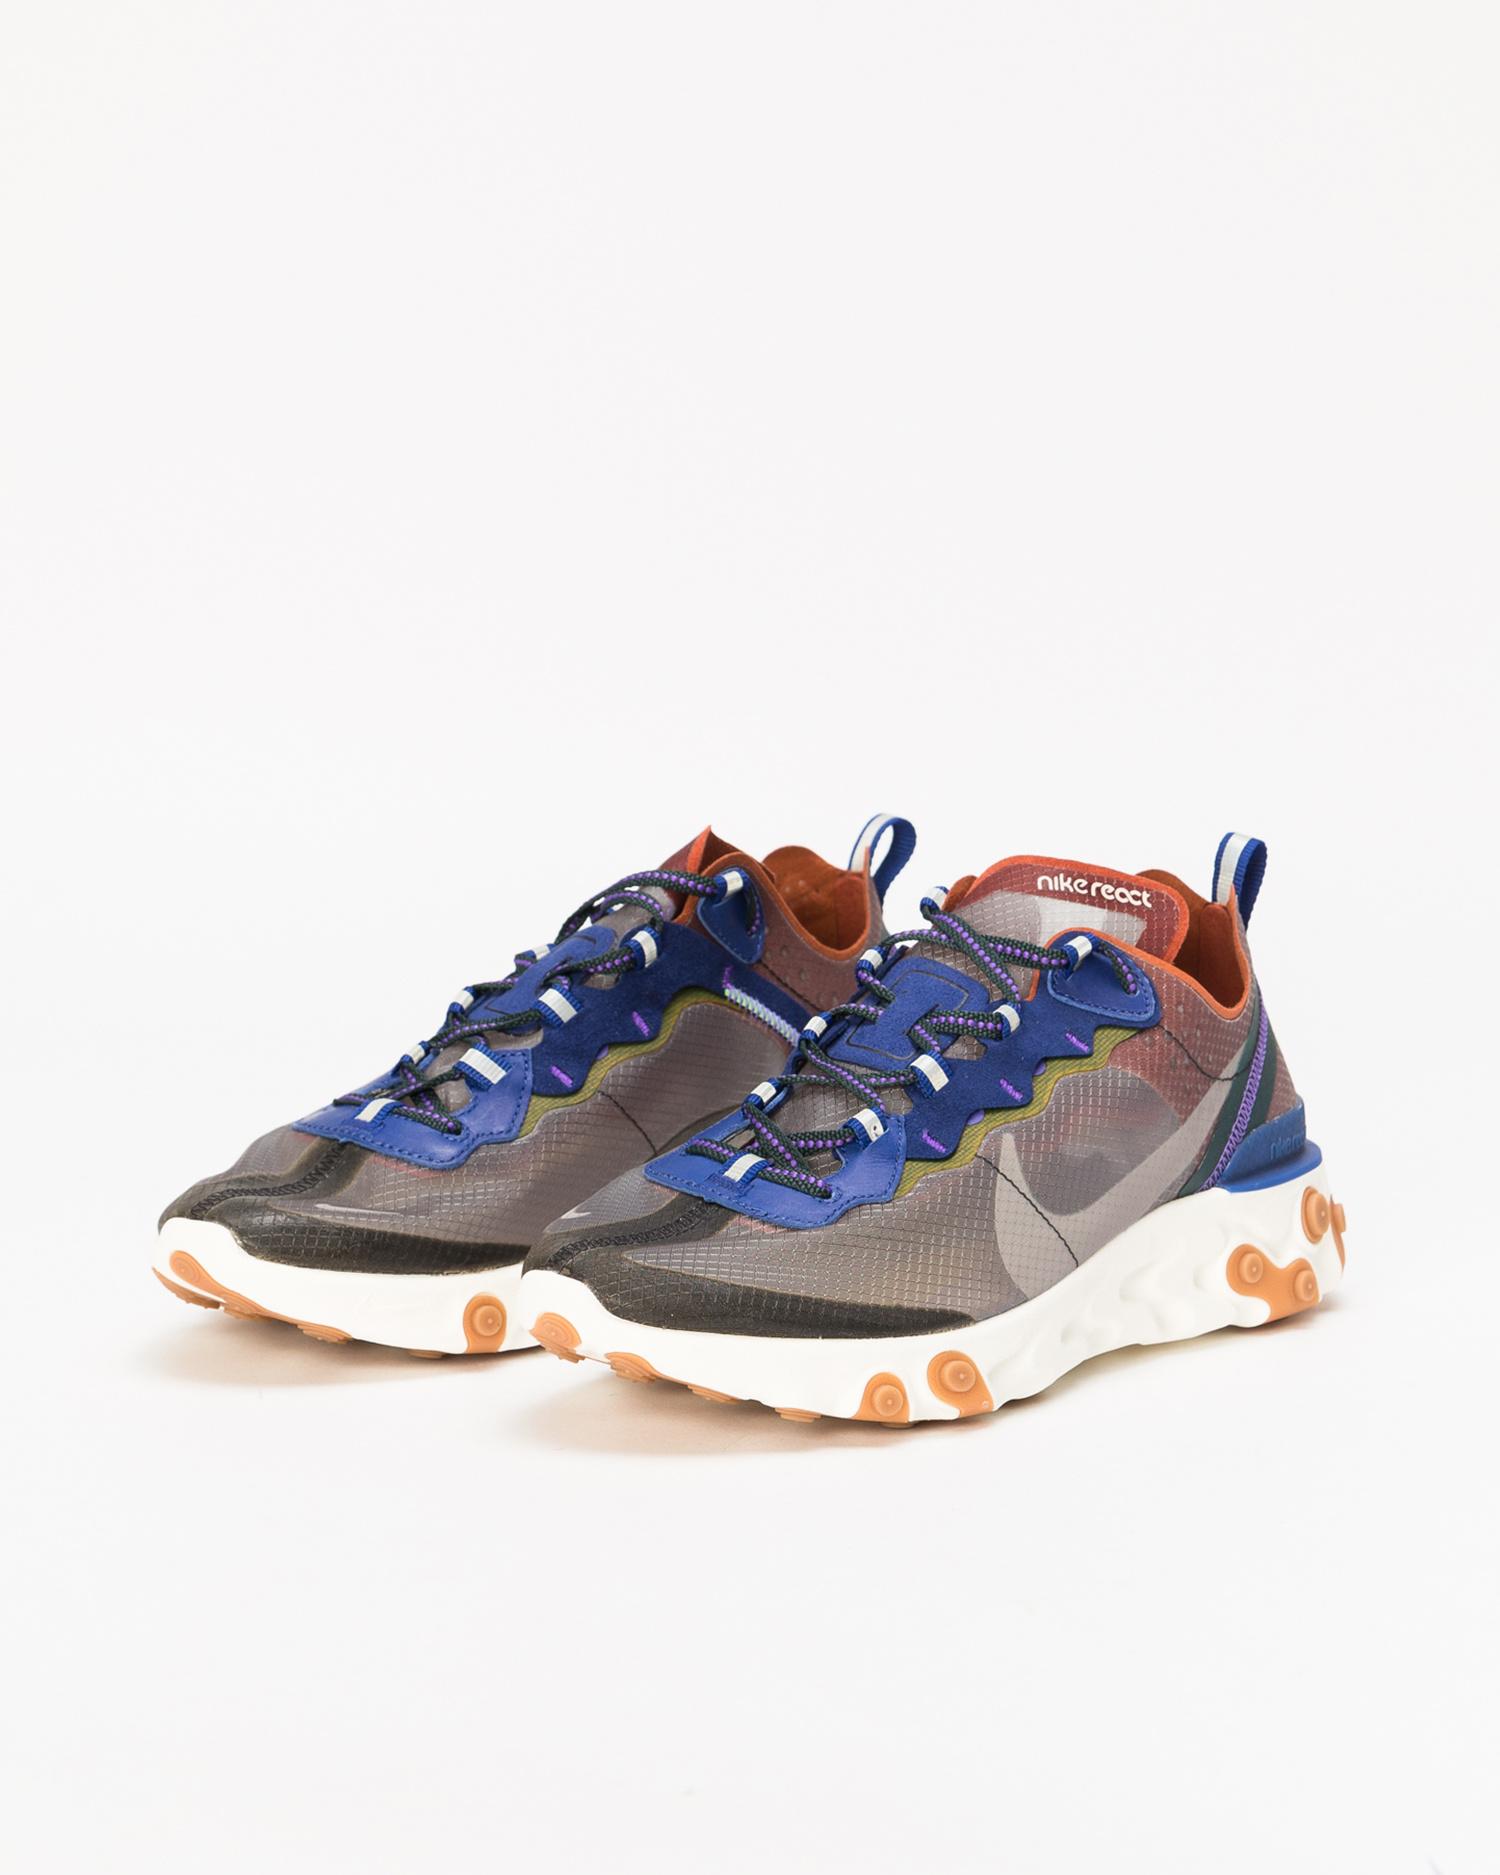 cheaper 00a7d e399c Nike React Element 87 Dusty Peach Atmosphere Grey - Avenue Store